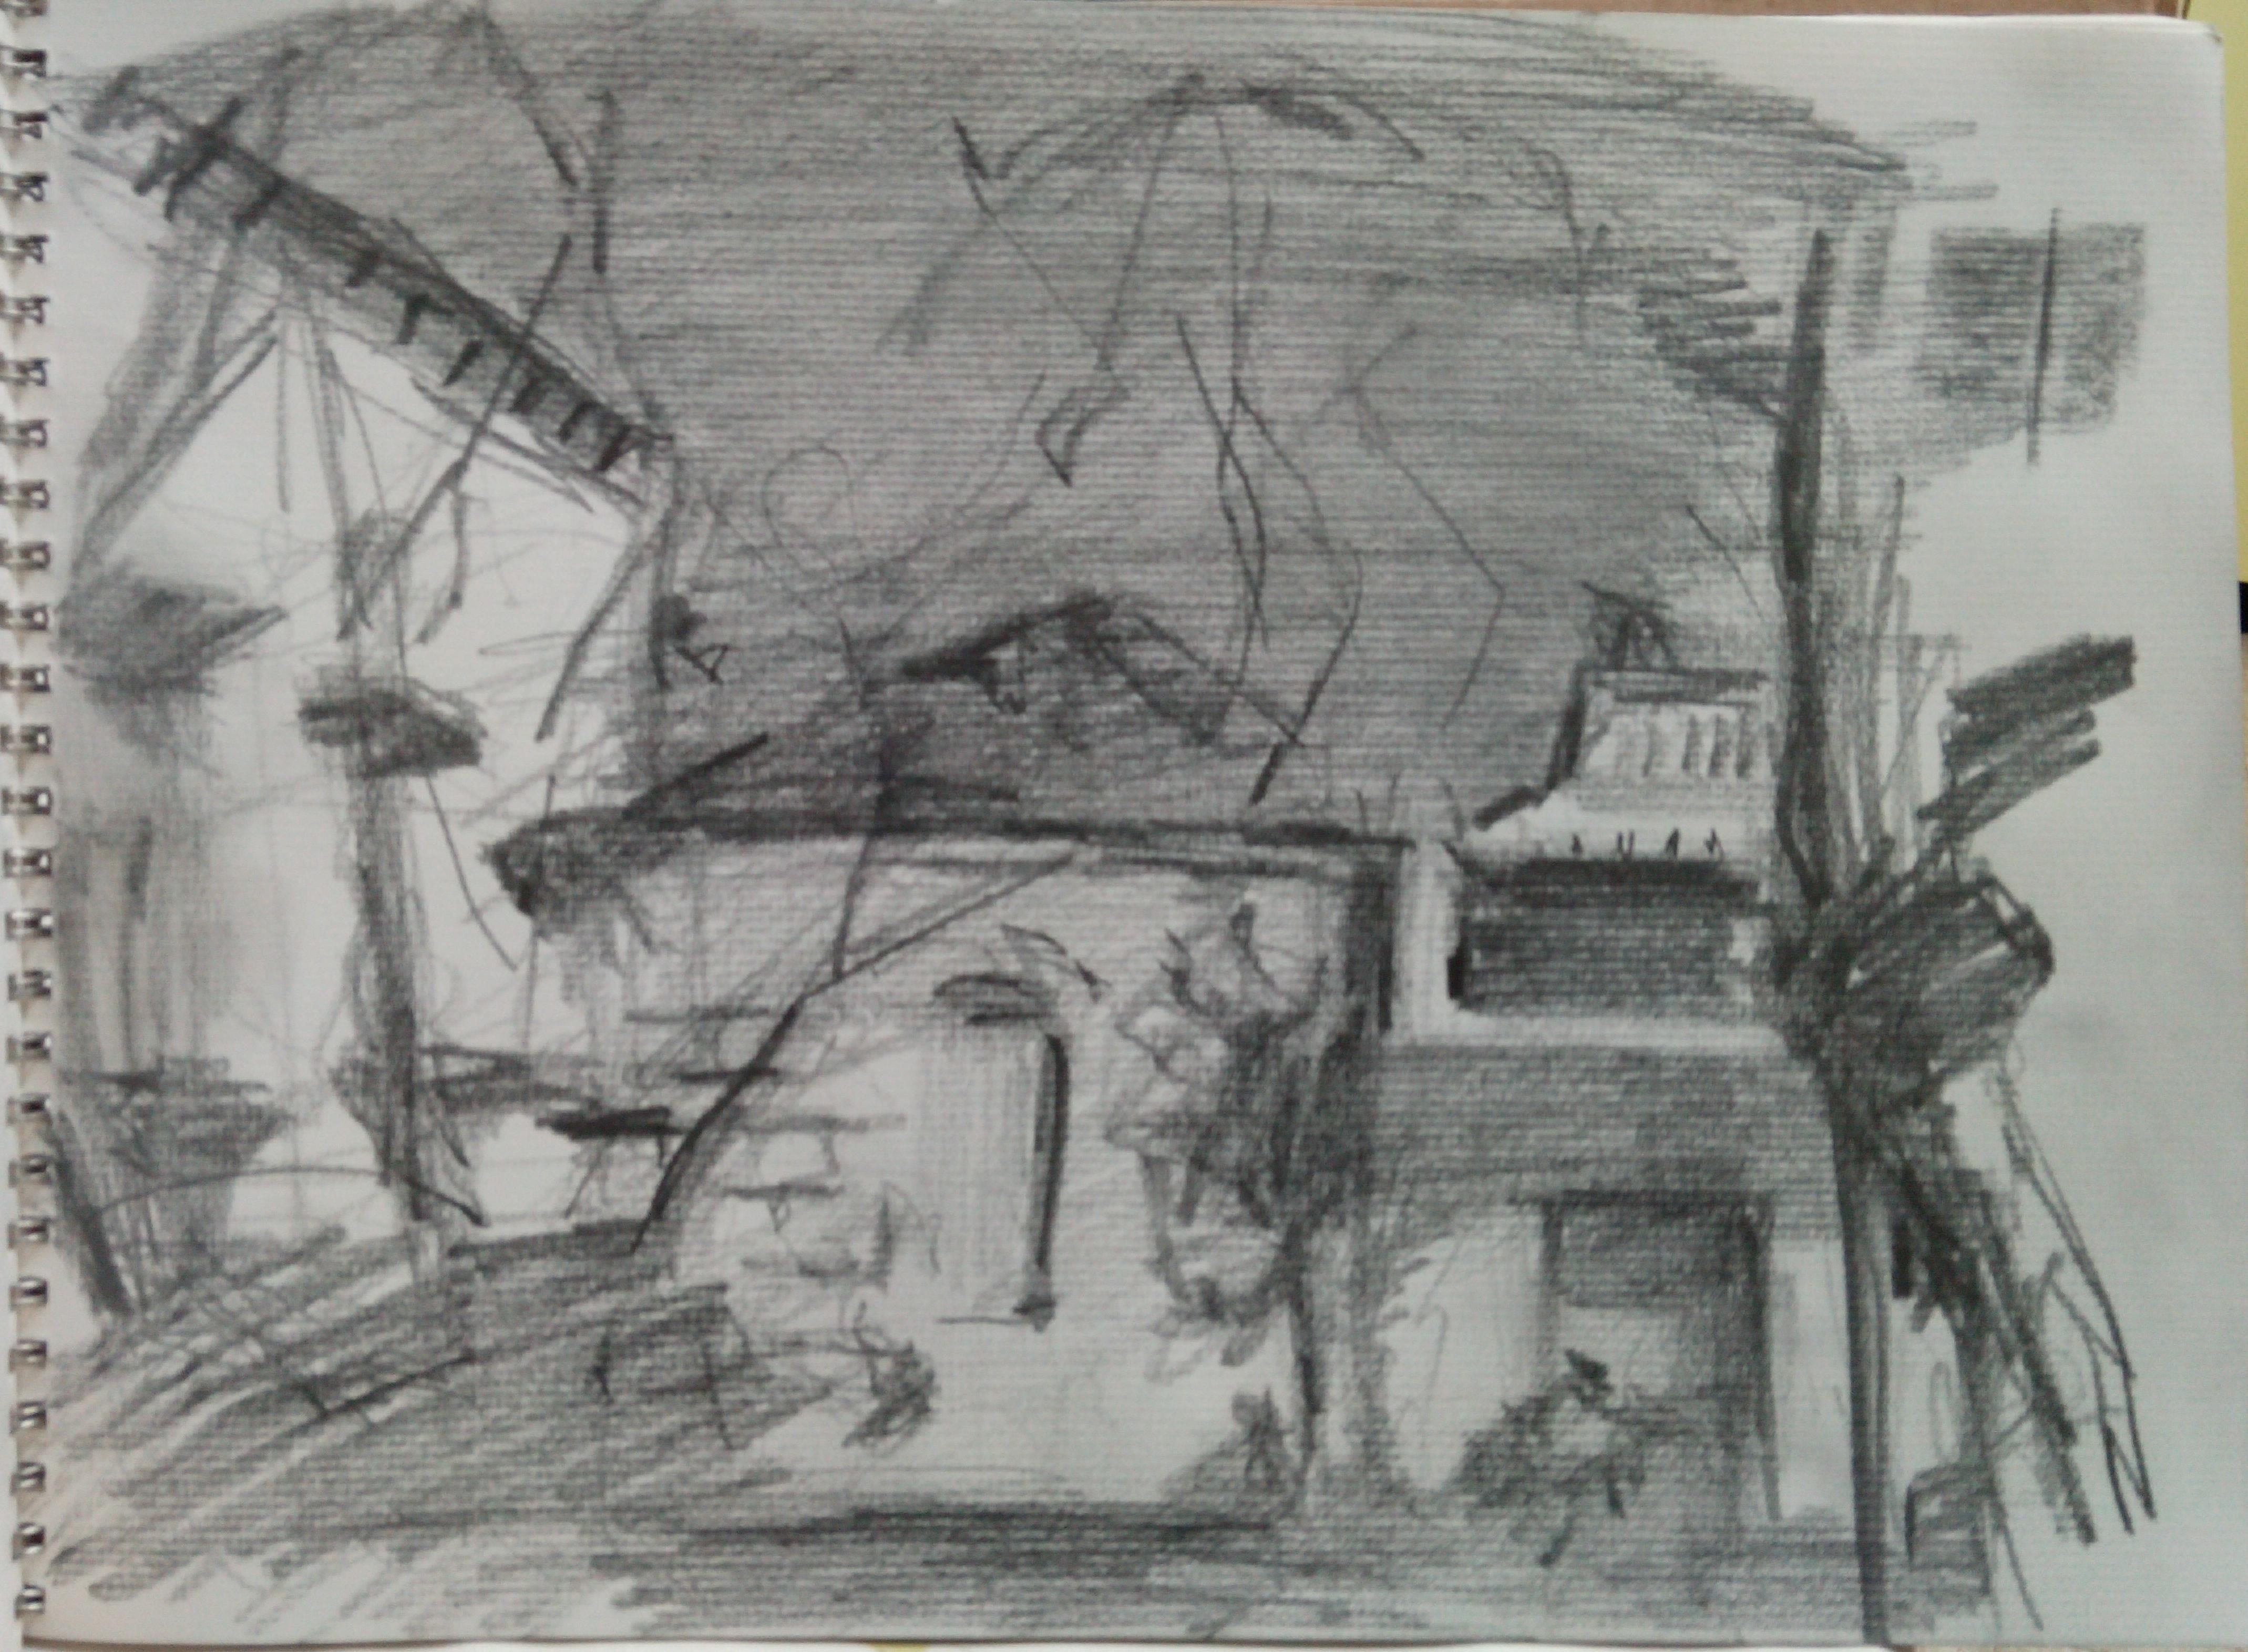 Jerusalem View / Pencil on Paper